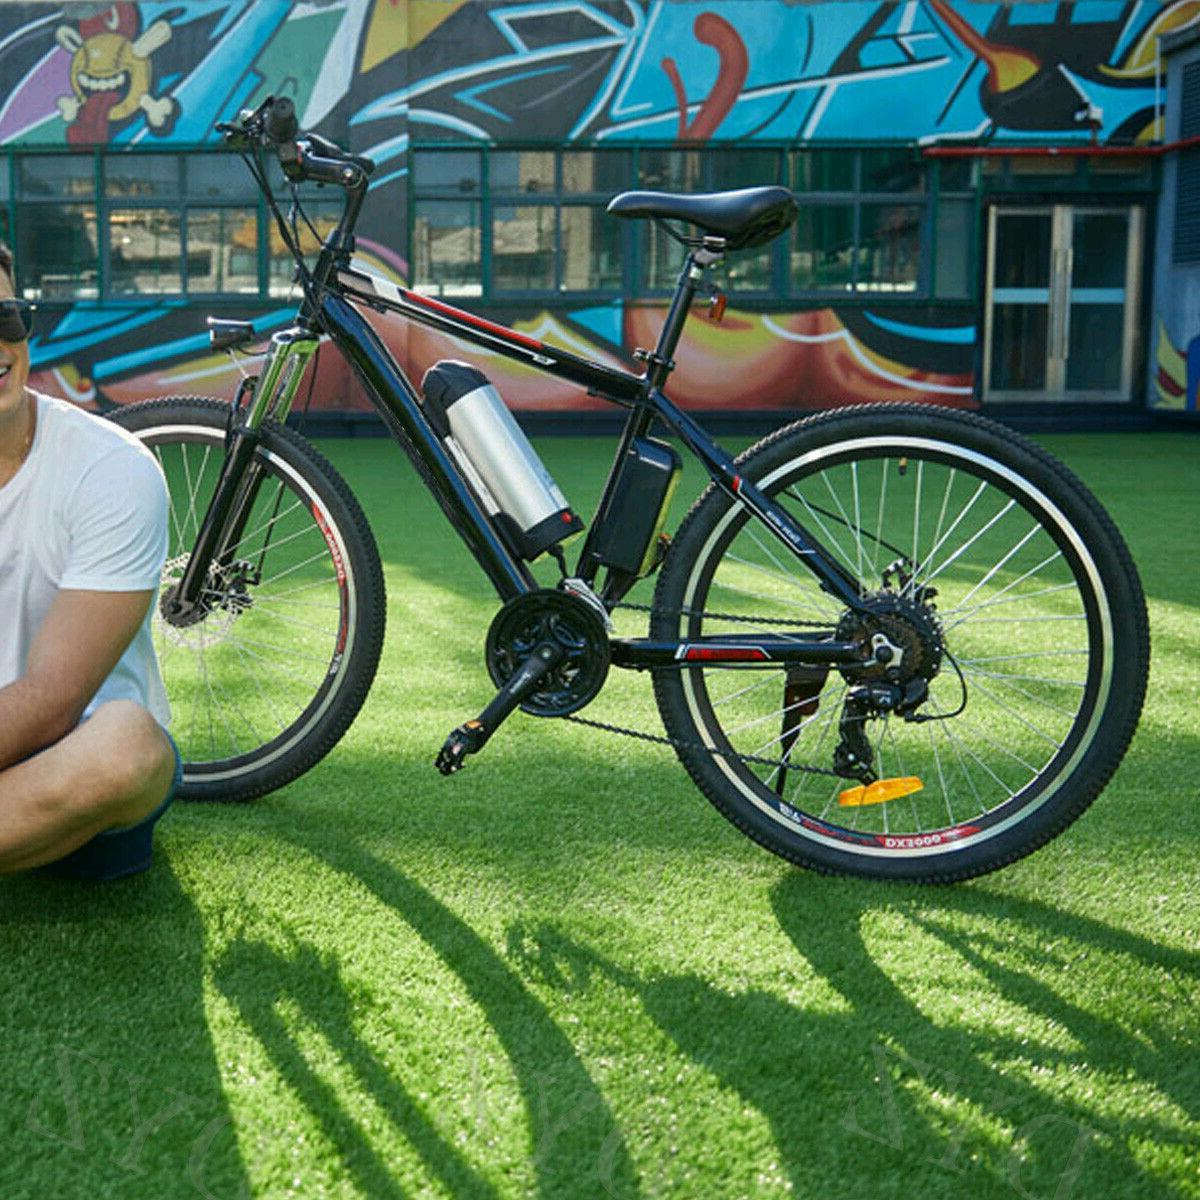 26INCH Bike Mountain Bicycle EBike SHIMANO 21Speed 36V